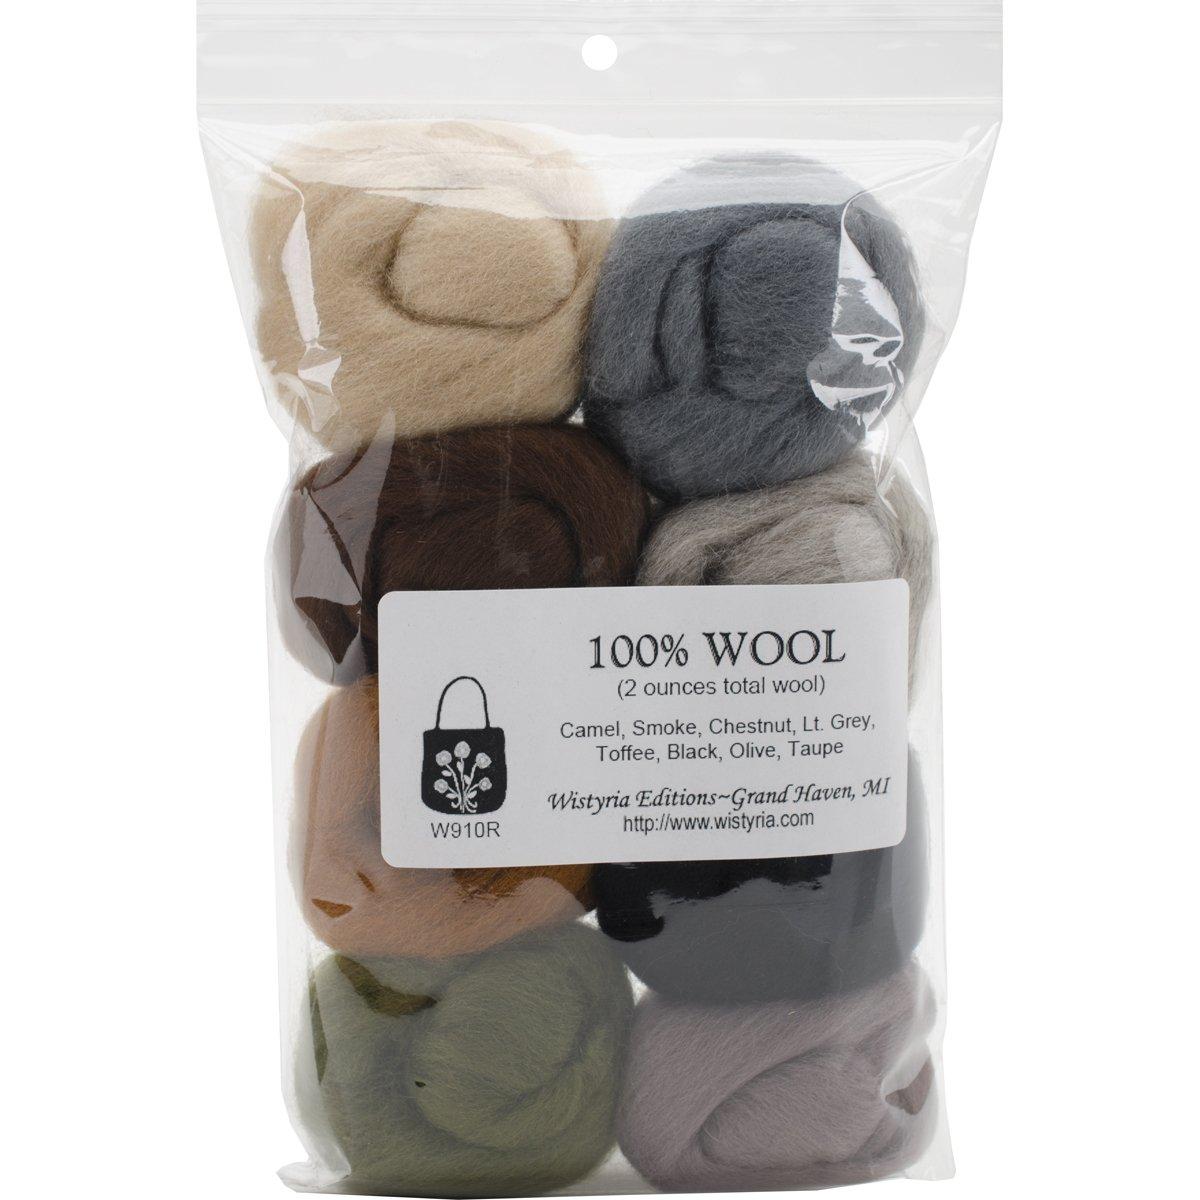 Rustic .22oz 8 Pack Wistyria Editions Wool Roving